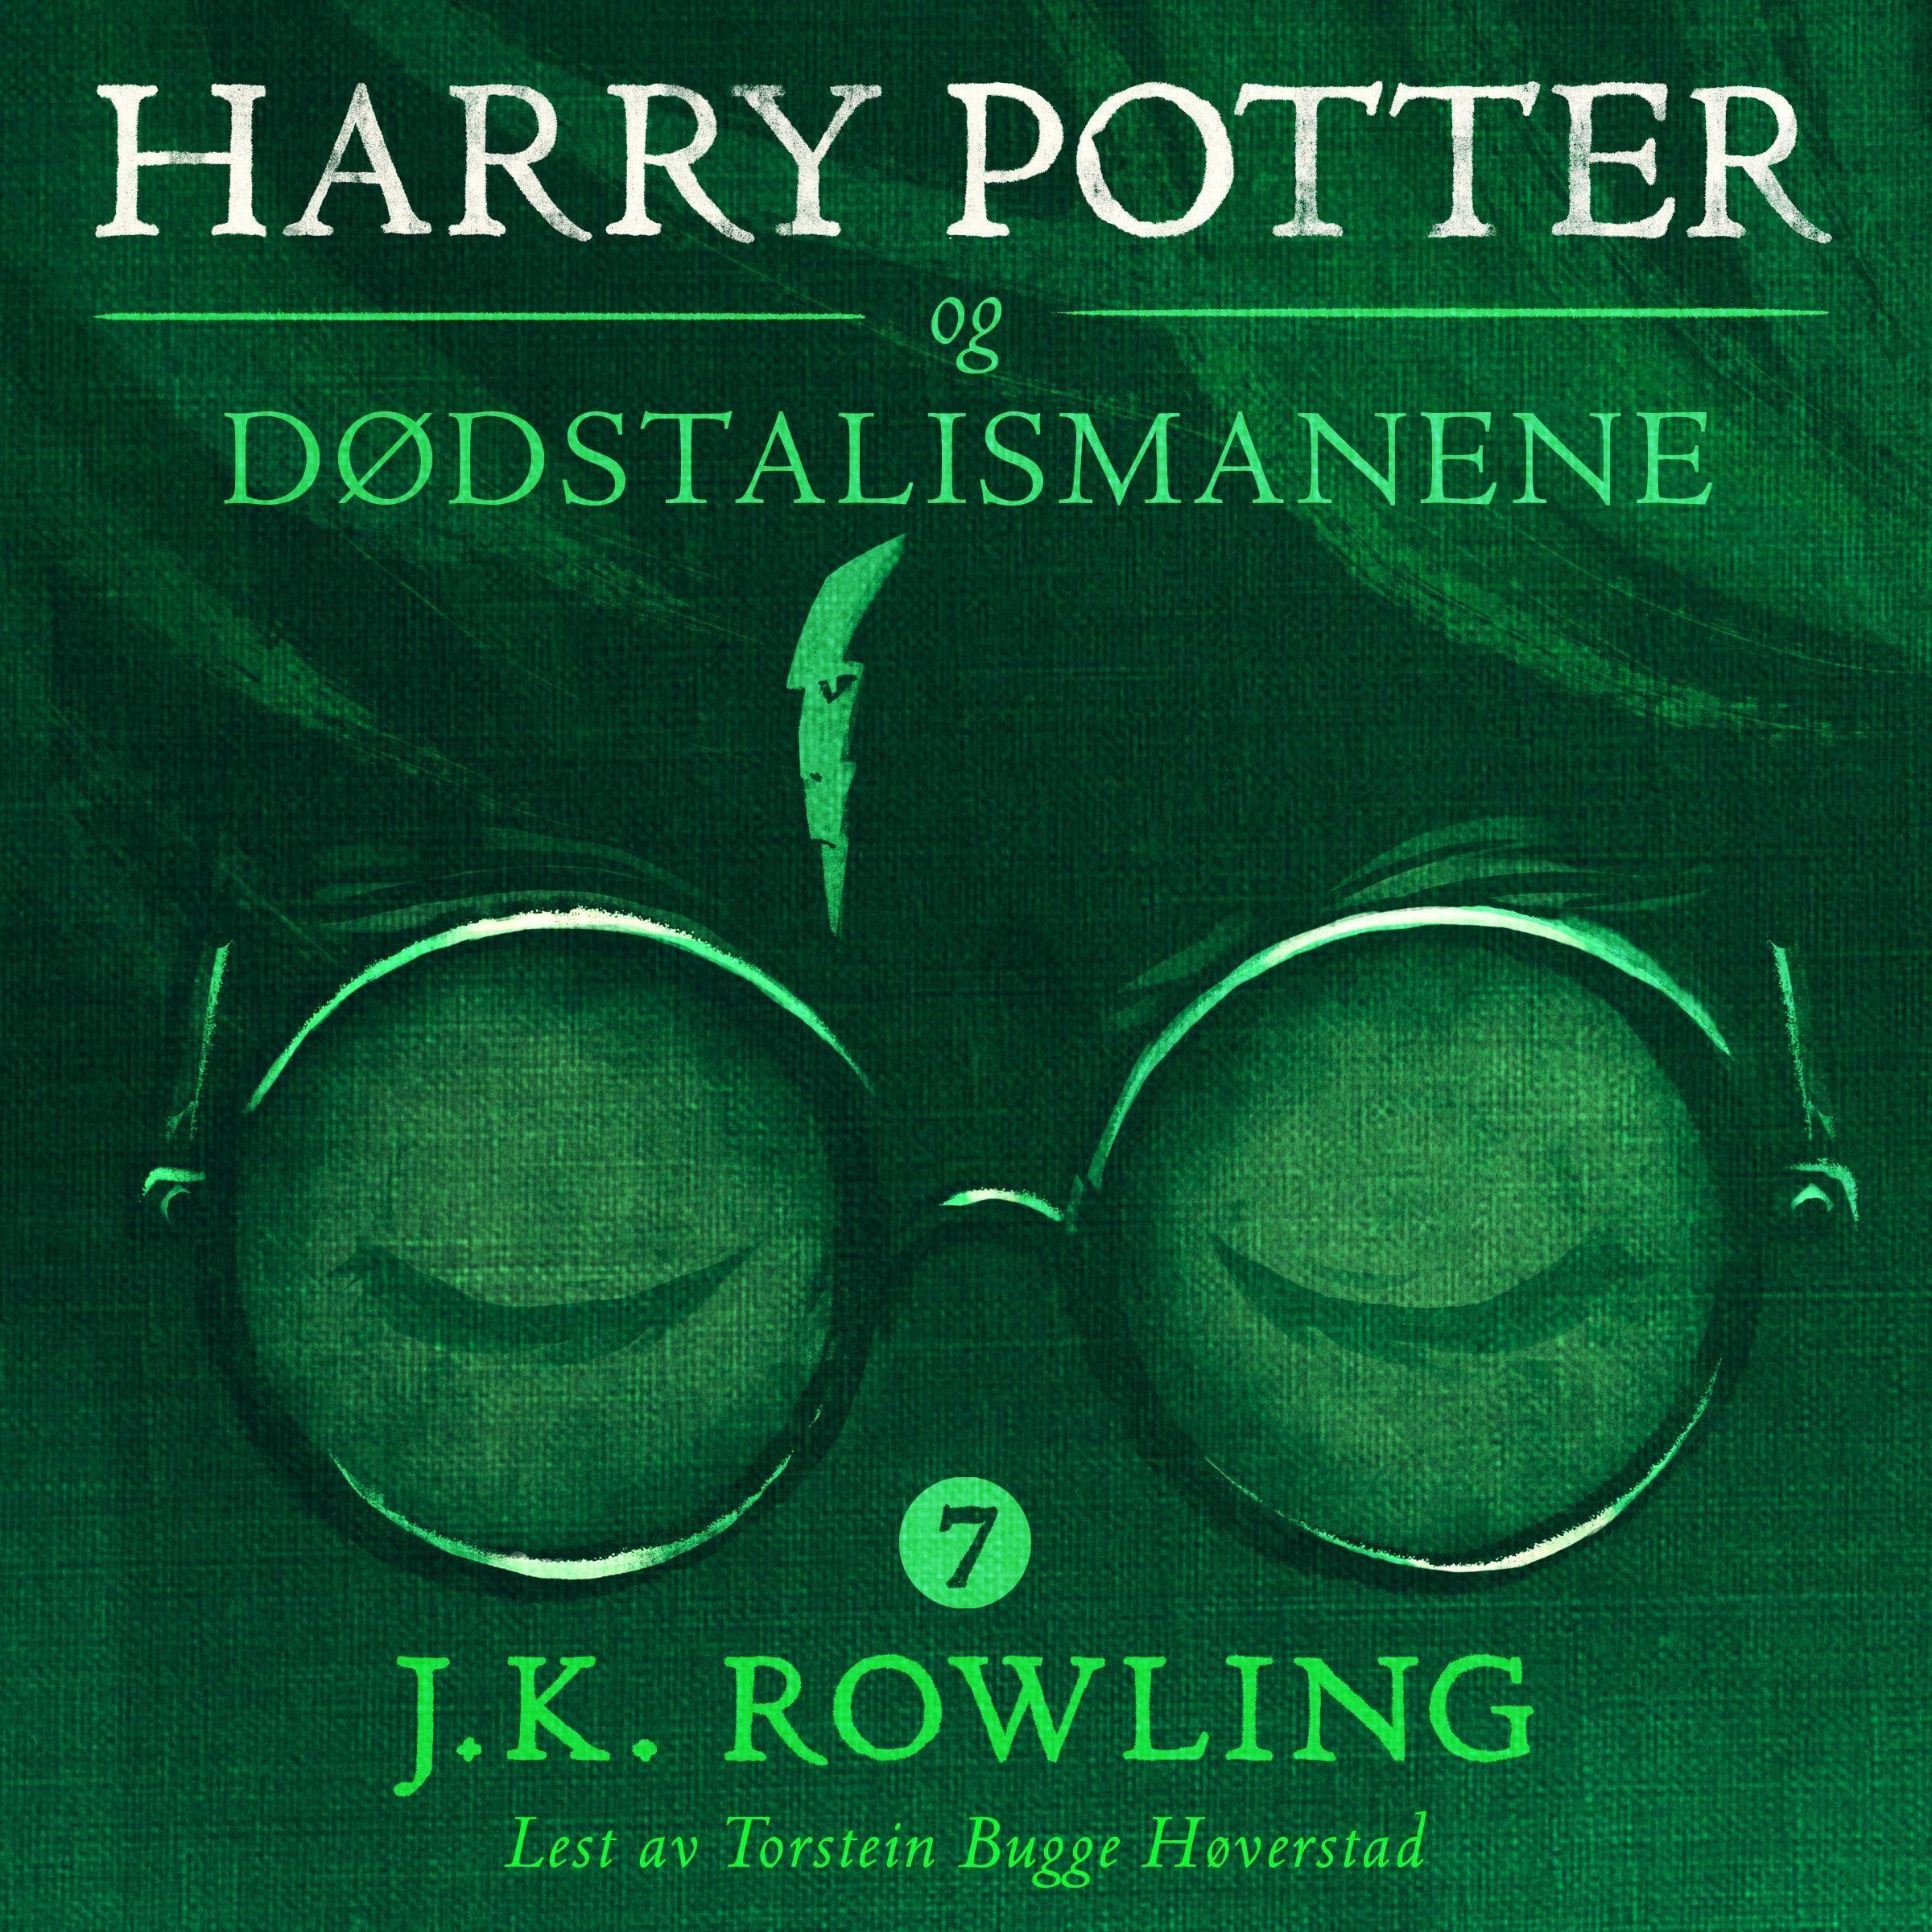 Harry Potter og Dødstalismanene: Harry Potter 7